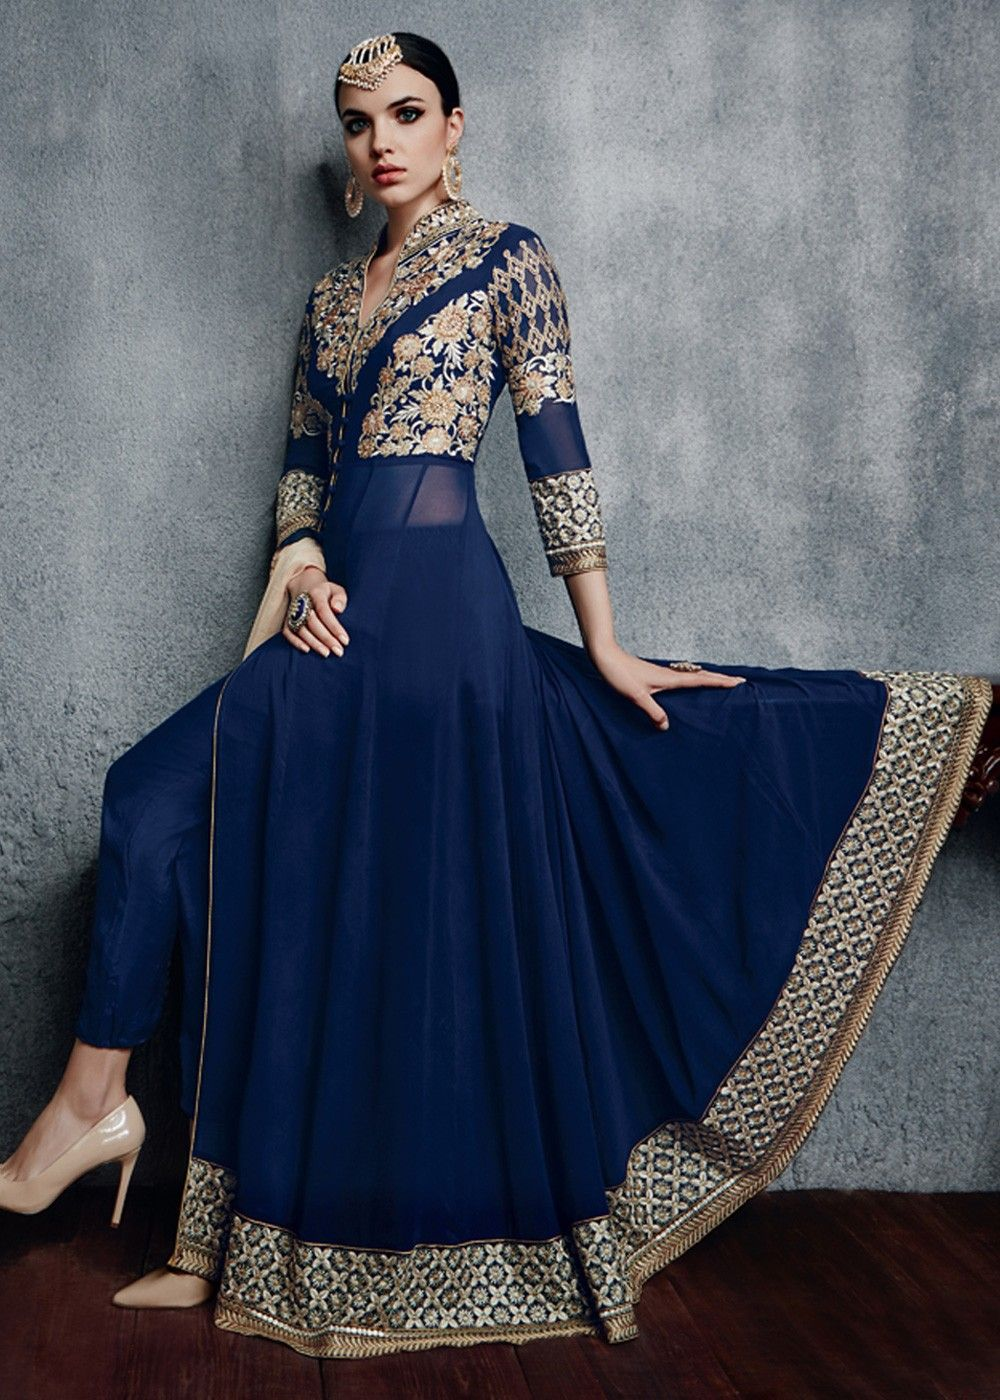 55b6066992 Buy Navy Blue Abaya Style Georgette Salwar kameez with Chiffon Dupatta  Online